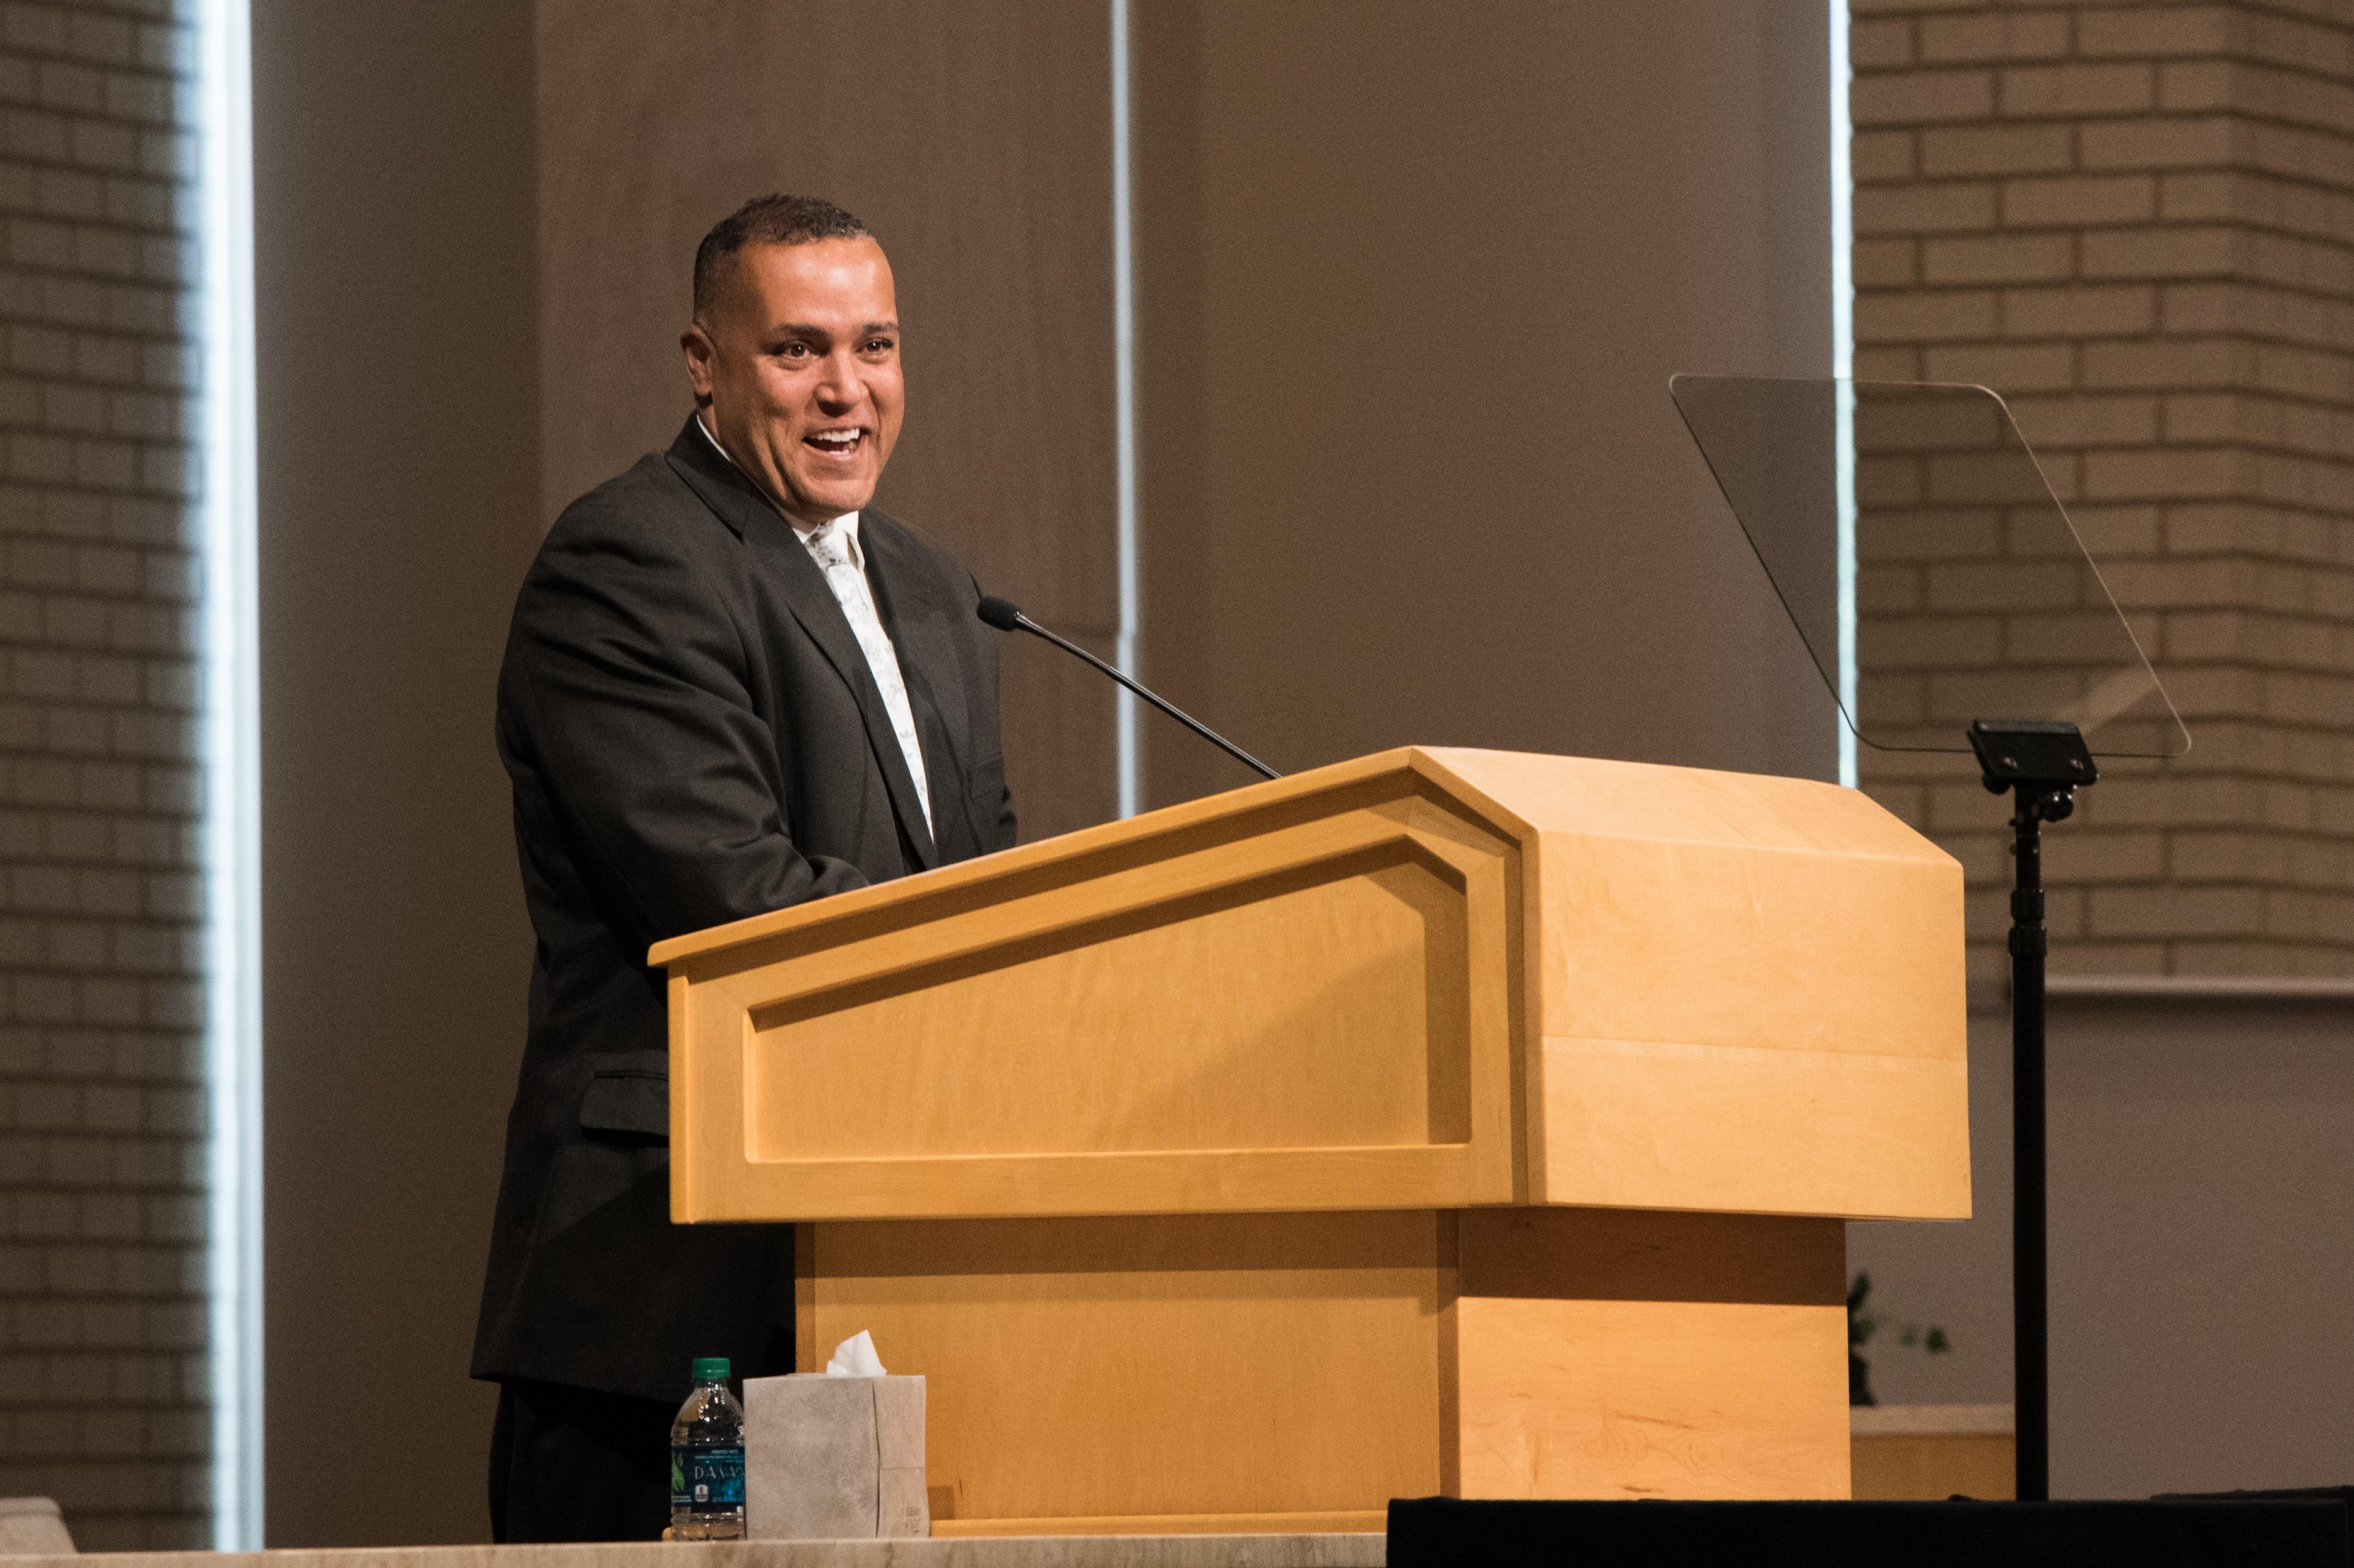 Eric Richards speaks during his BYU-Idaho Education Week keynote address.